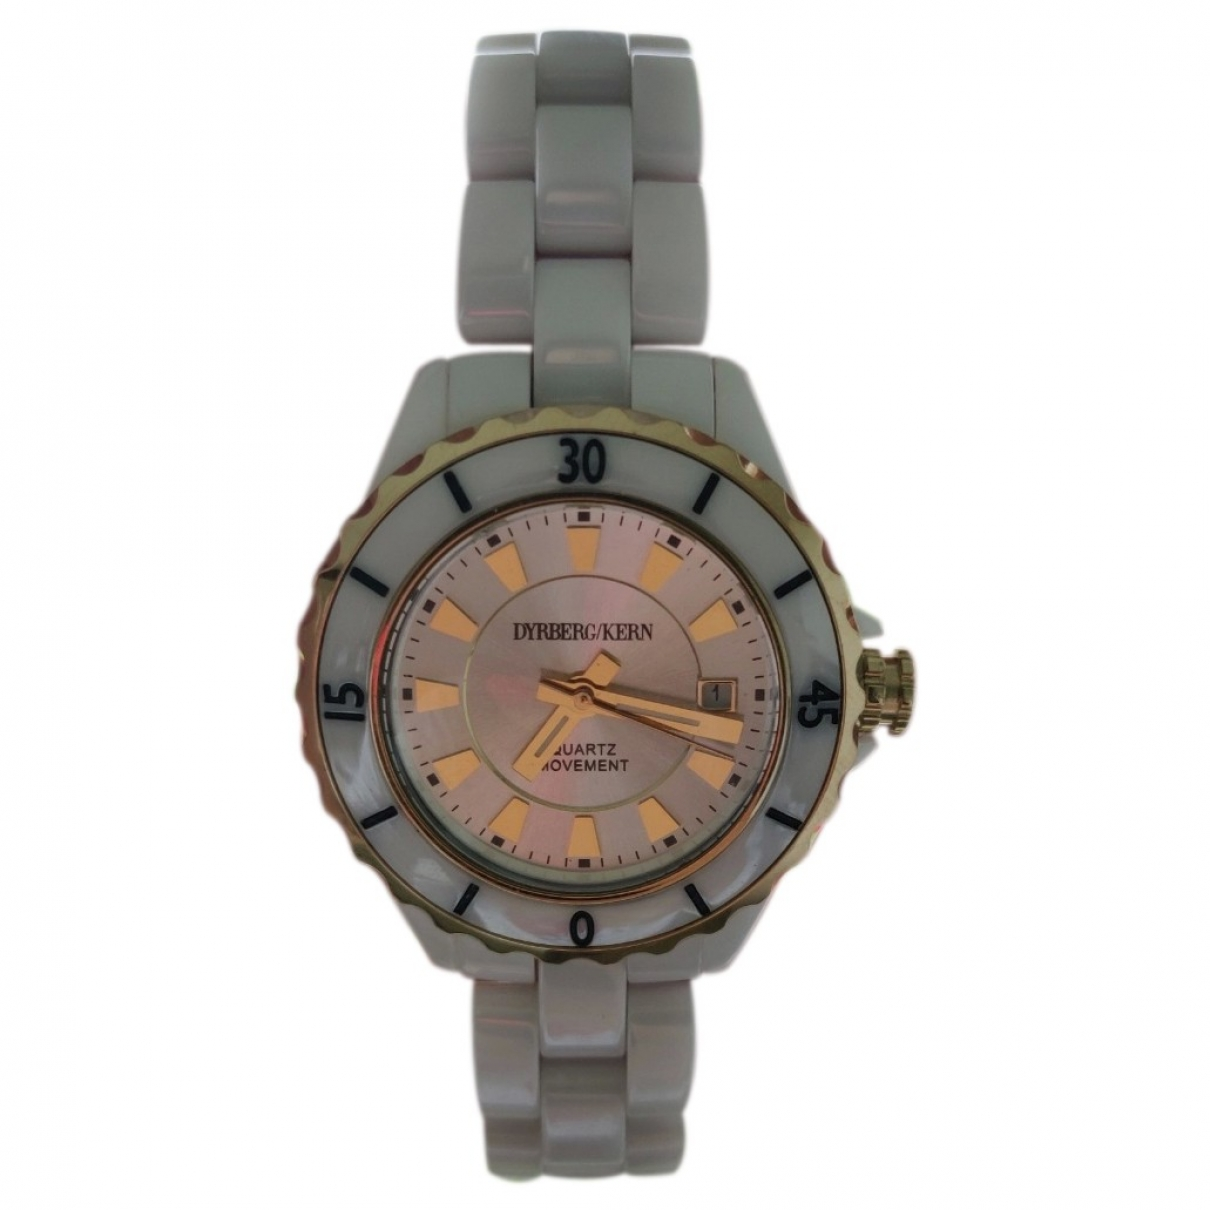 Dyrberg/kern \N White Ceramic watch for Women \N